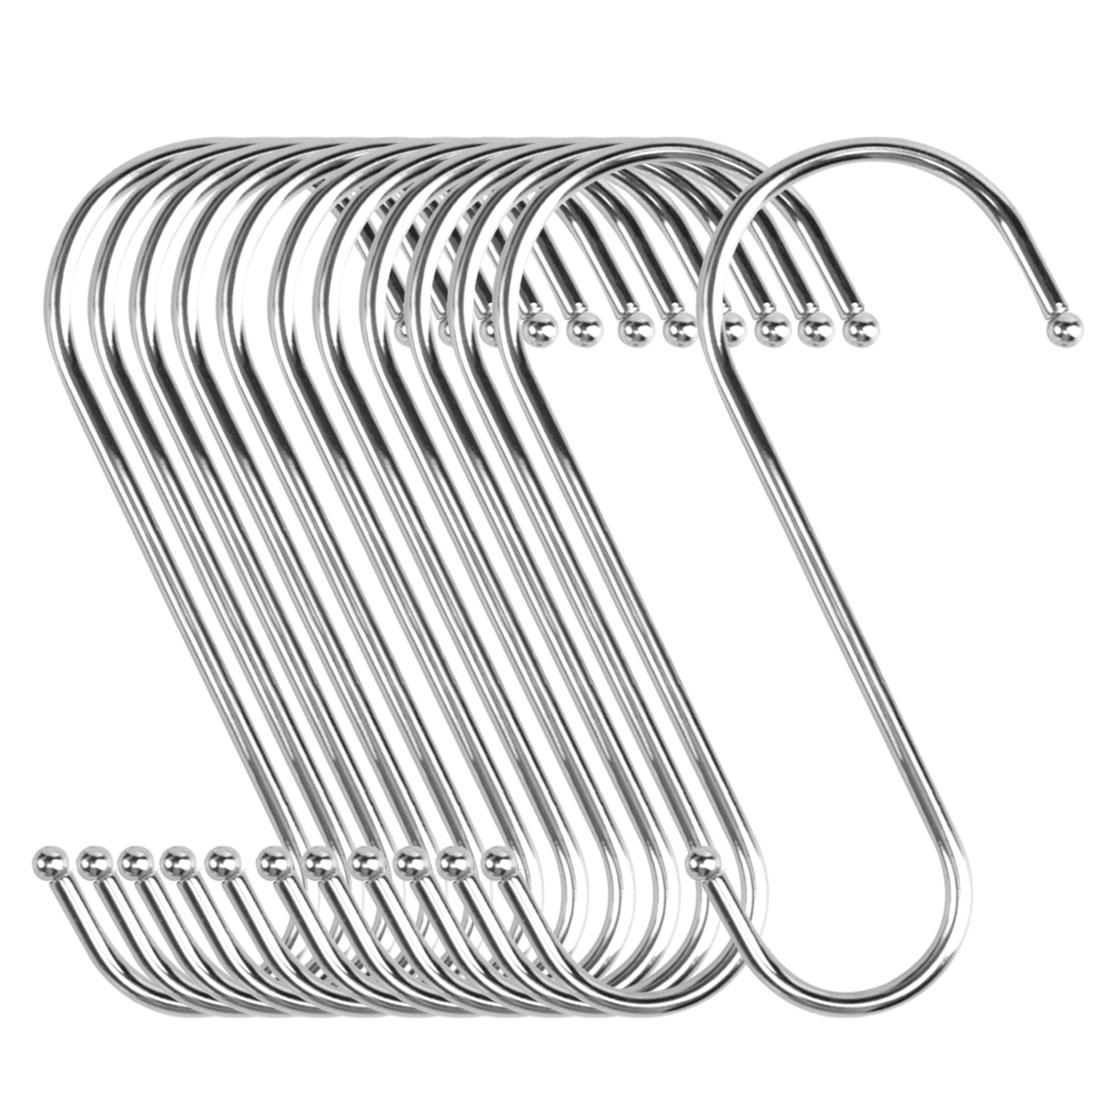 12pcs S Shaped Hook Stainless Steel Kitchenware Hat Utensil Pot Holder